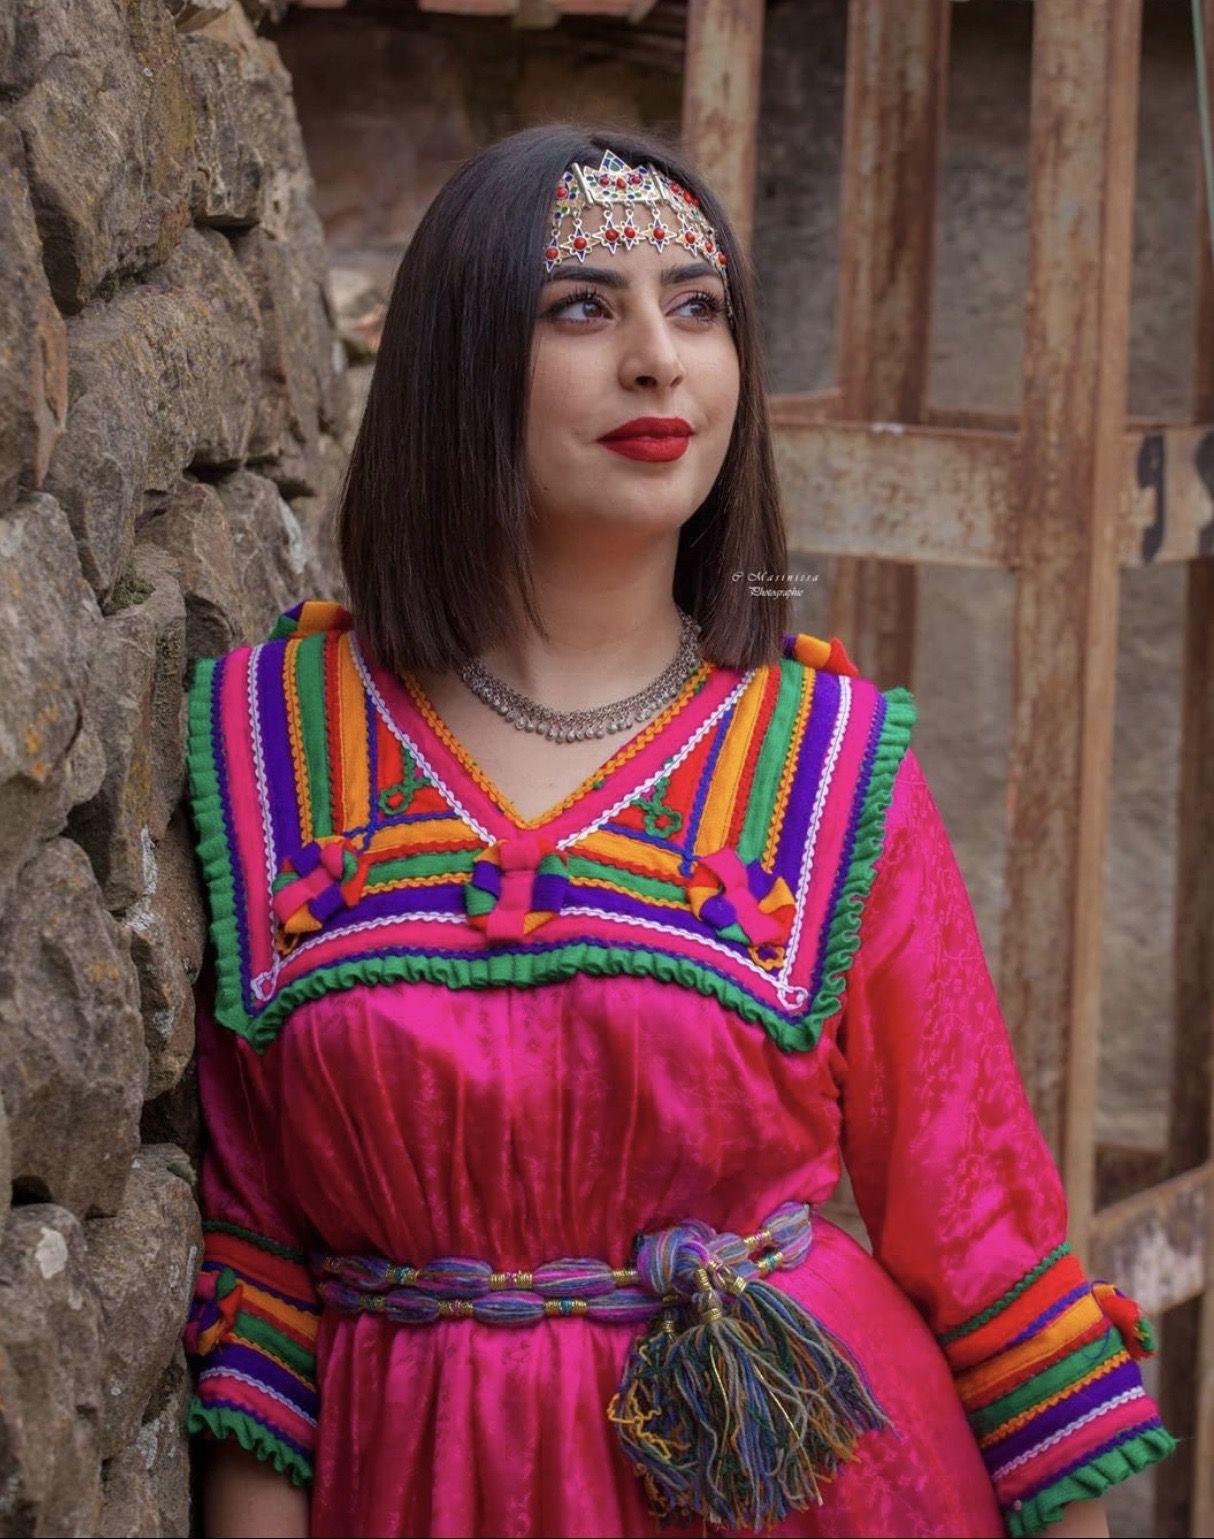 Épinglé par Regard Eloigné sur * Robe Kabyle * en 2020 ...